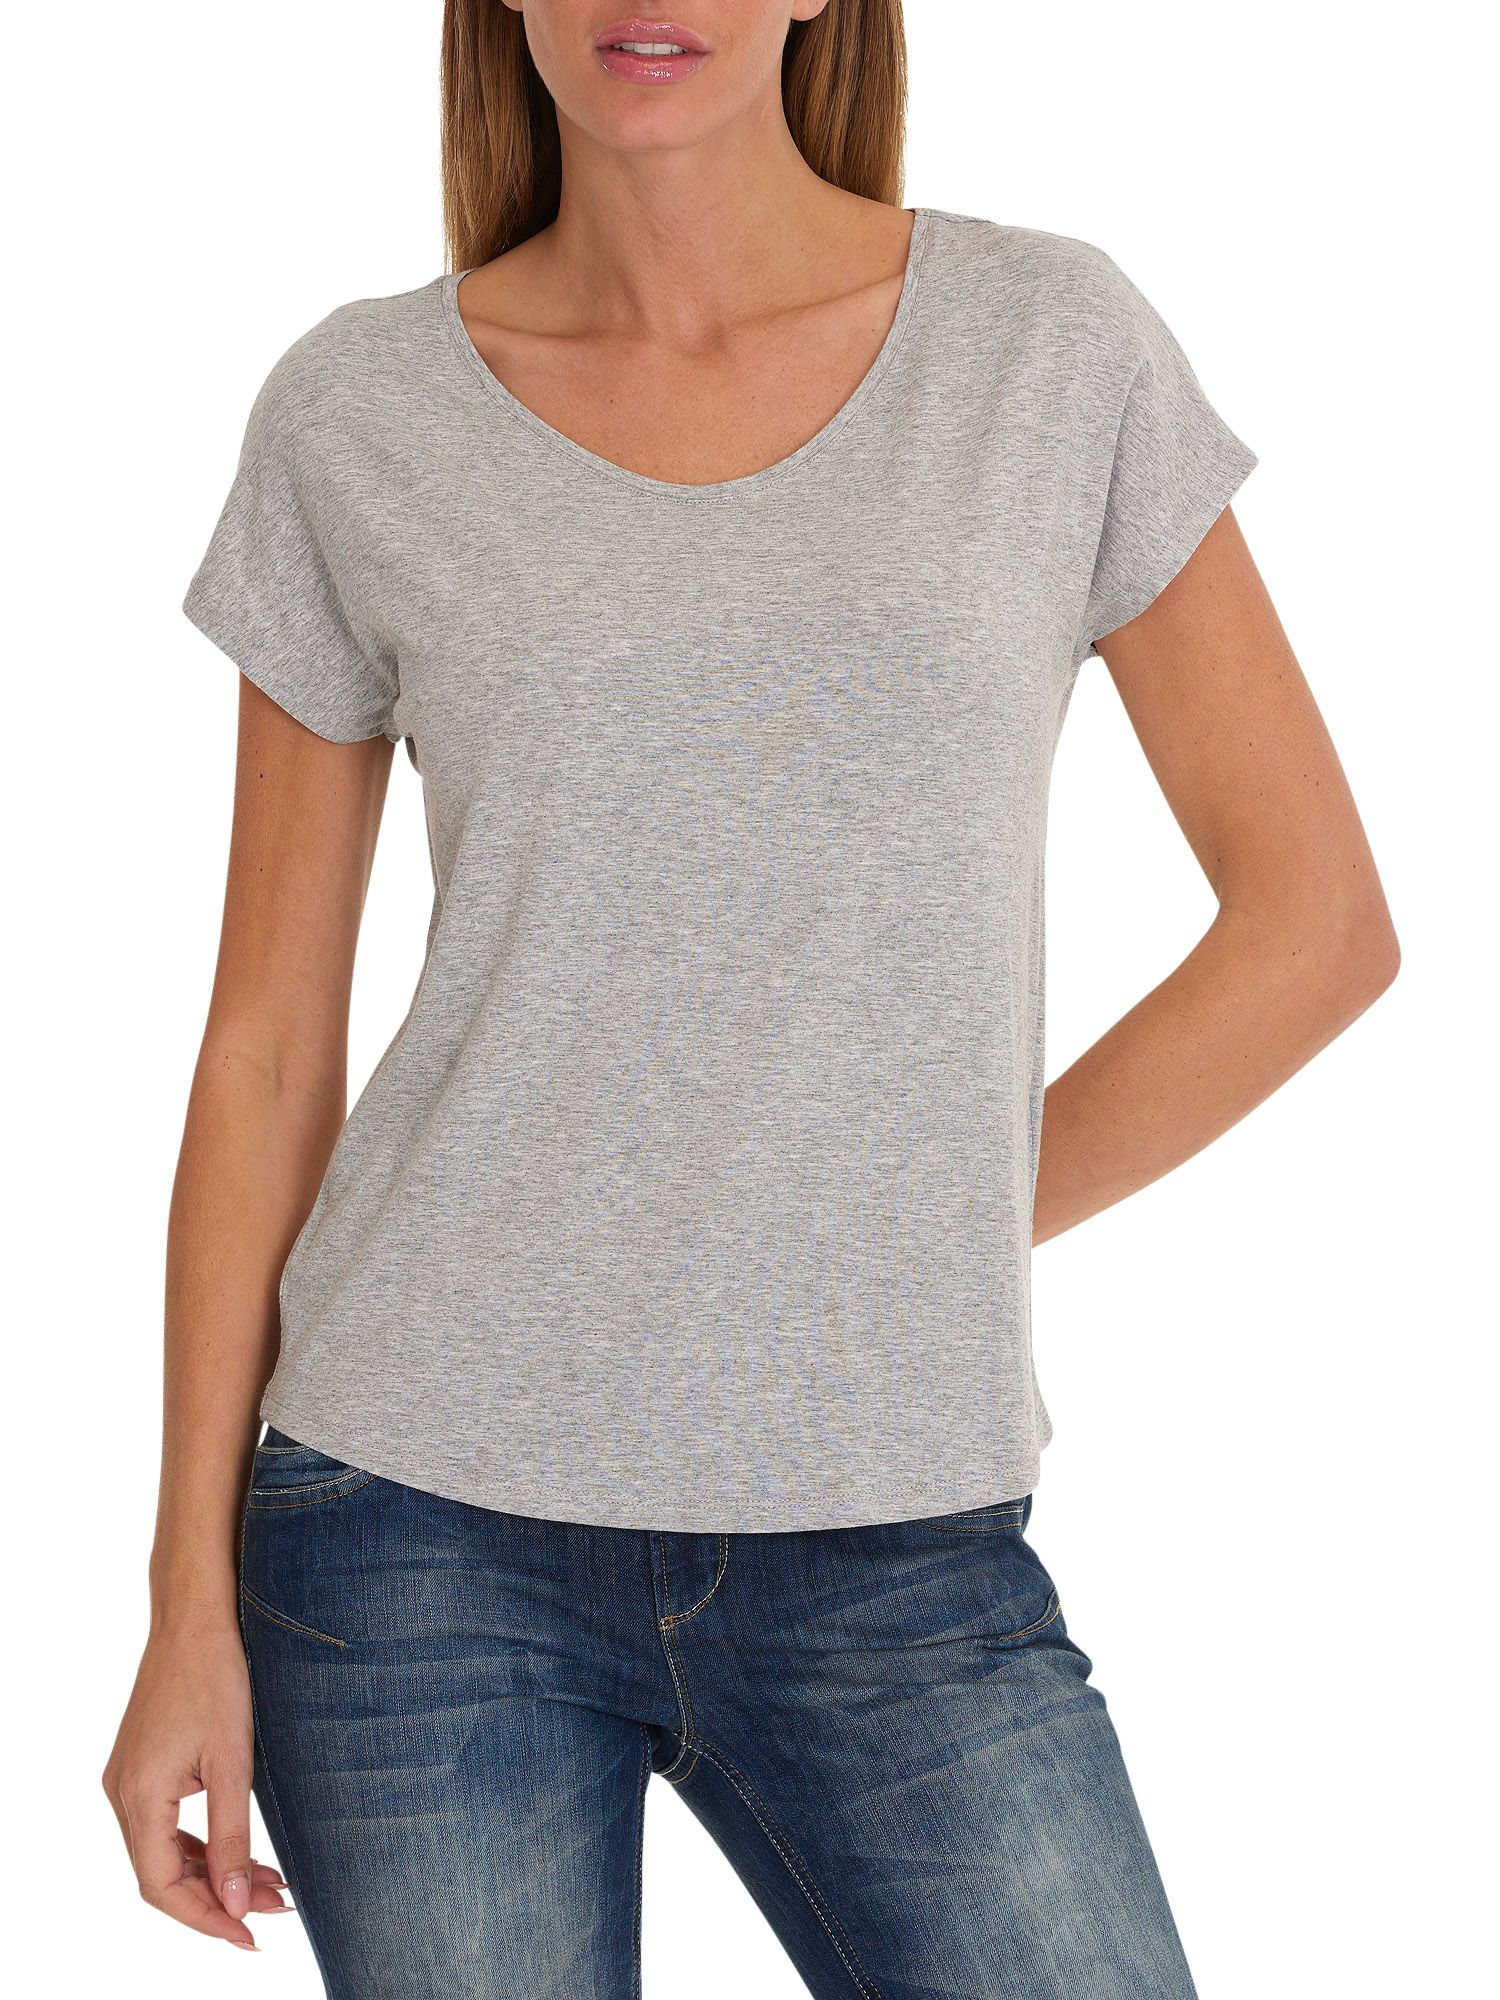 Betty Barclay Betty Barclay V-Neck Cap Sleeve T-Shirt, Light Silver Melange